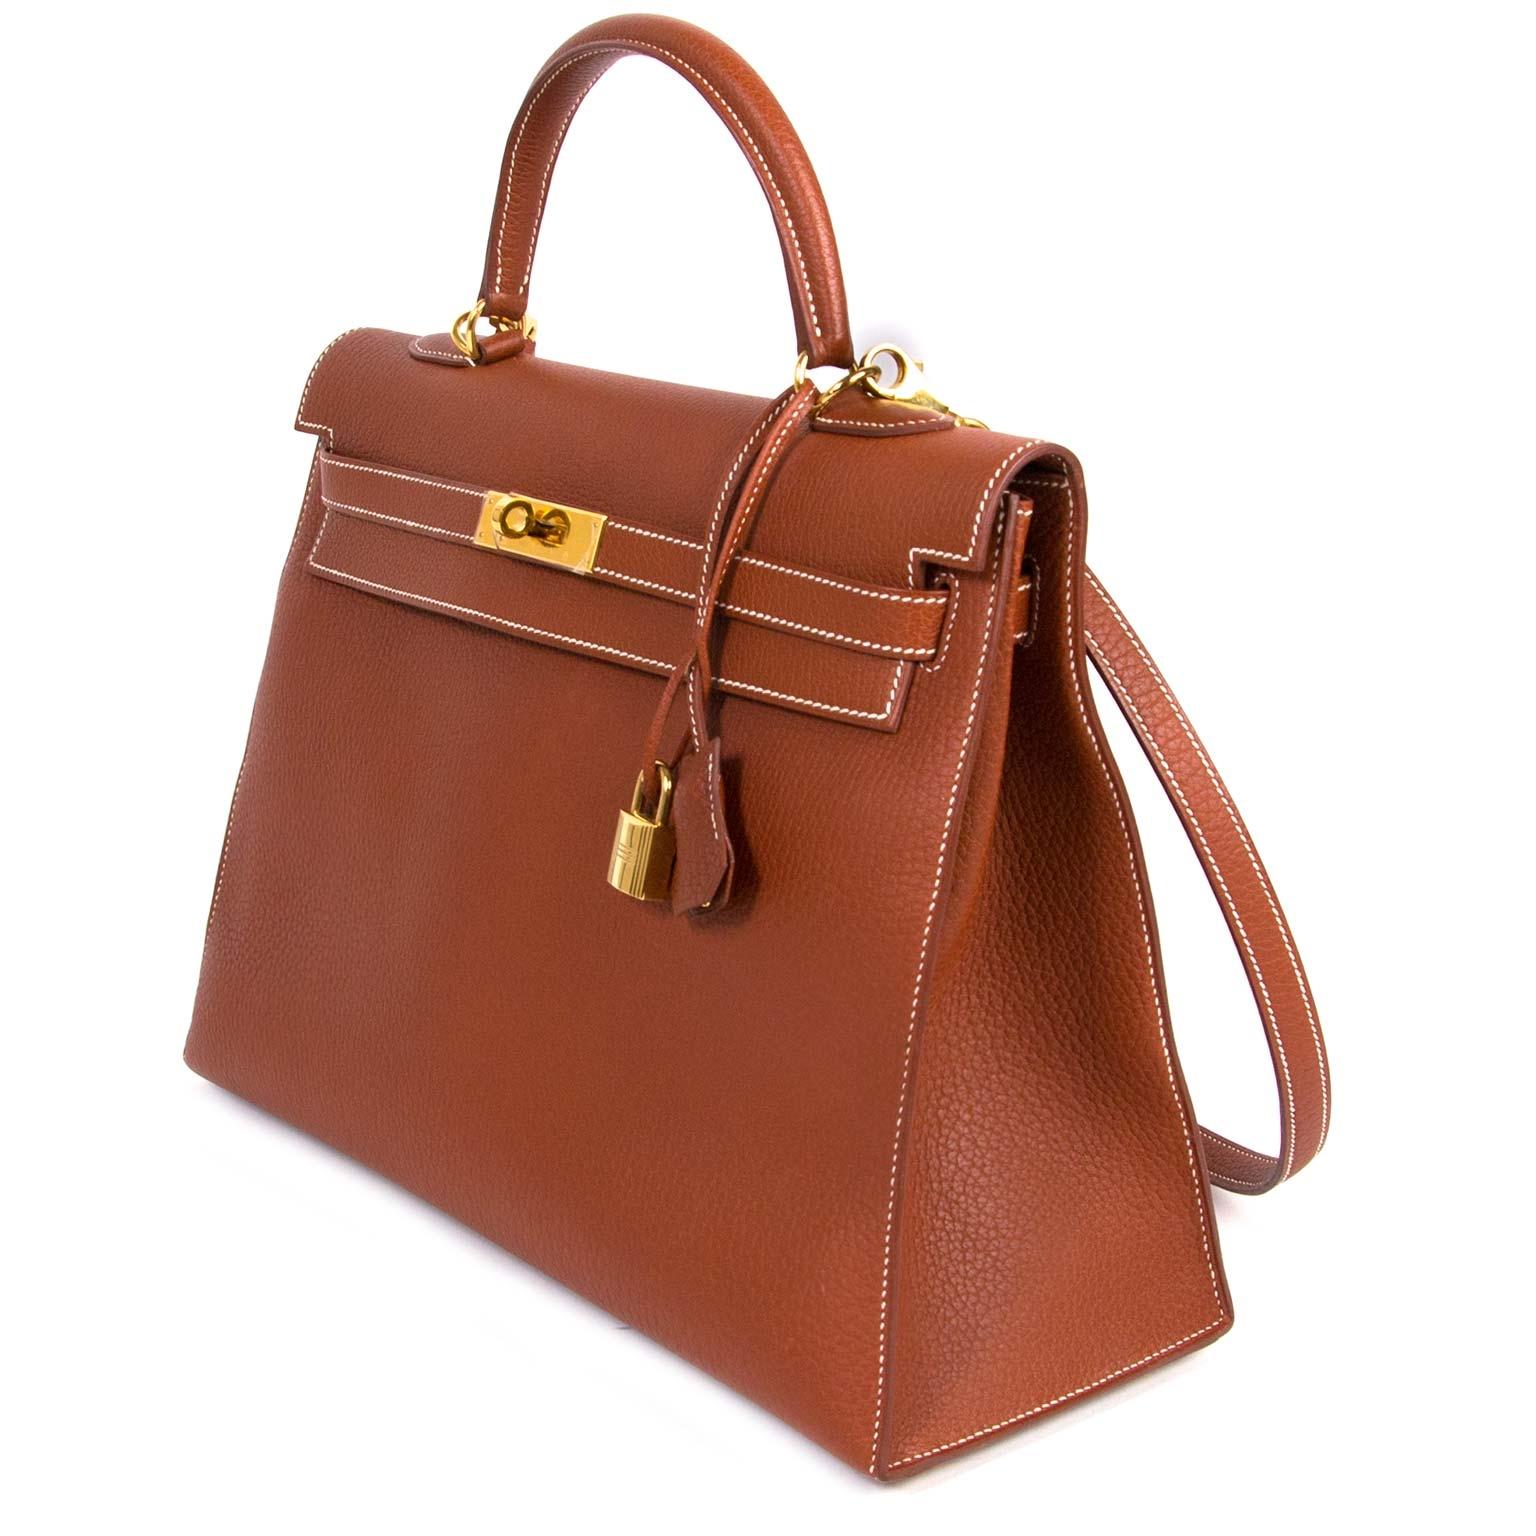 shop safe and secure online at labellov.com Hermès Kelly 35 Etrusque Veau Fjord GHW